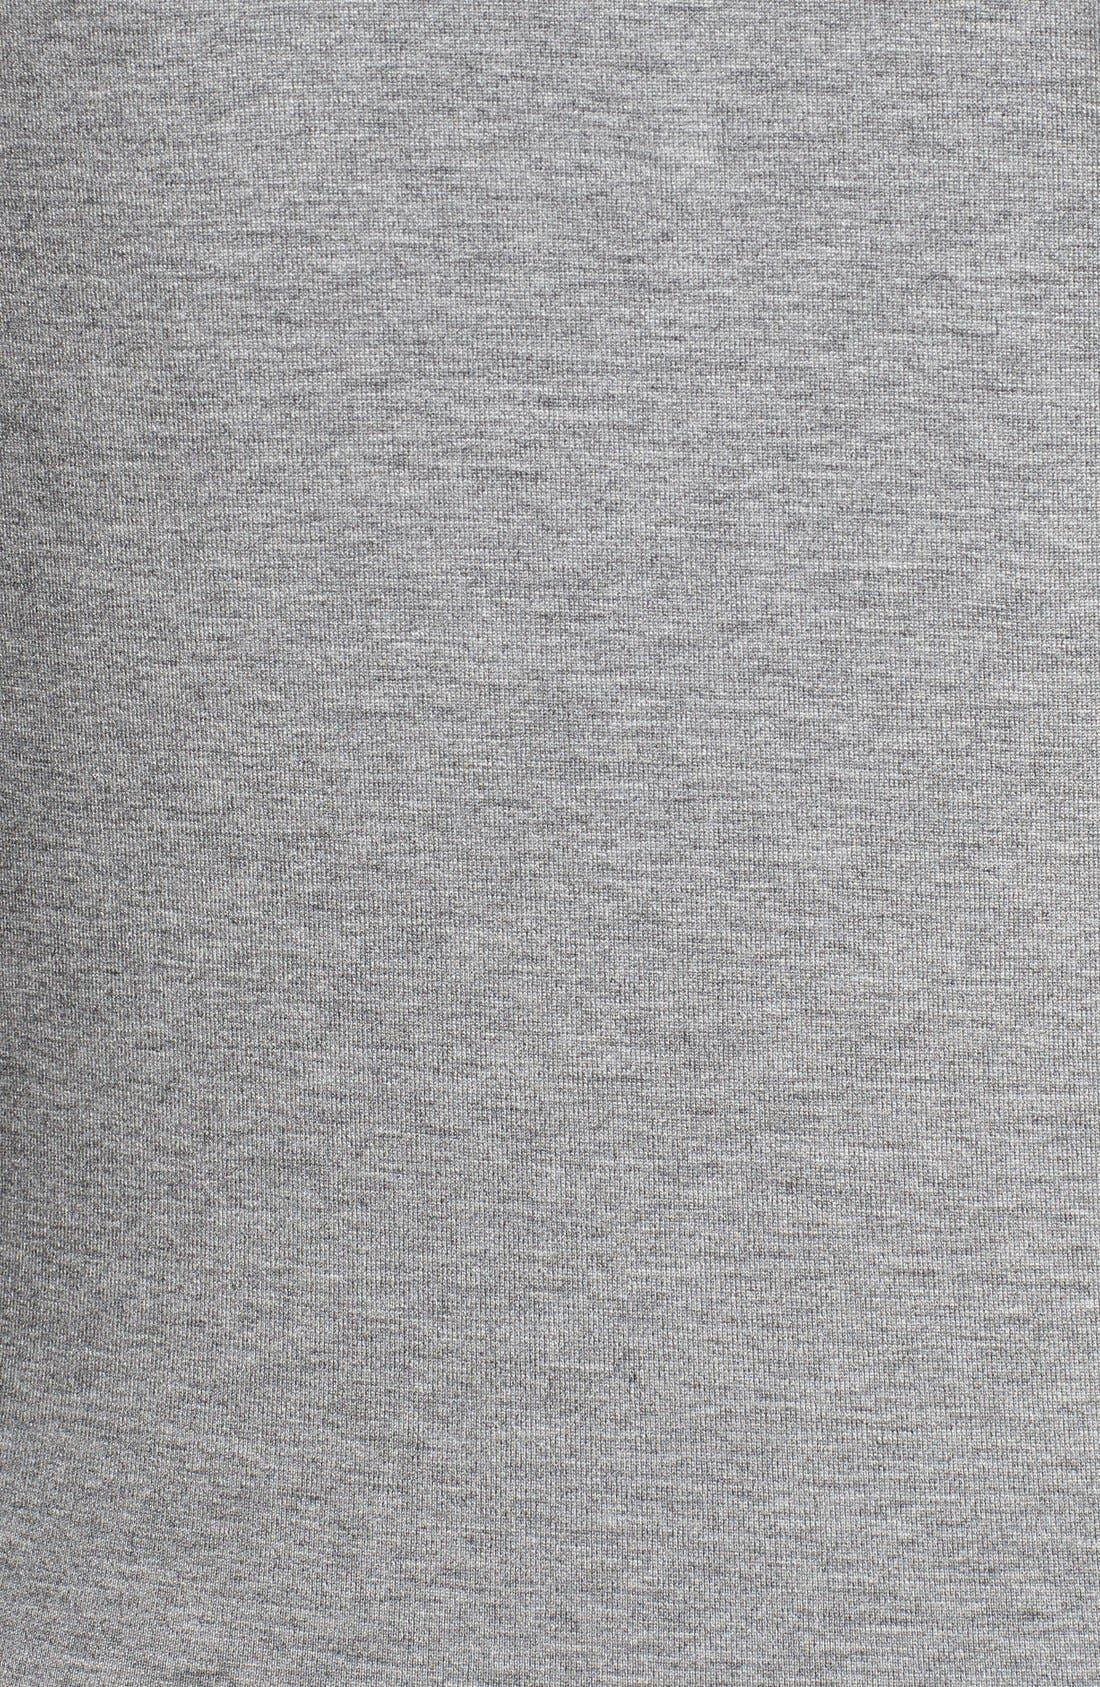 Alternate Image 4  - Max Mara 'Caprice' Faux Wrap Jersey Top